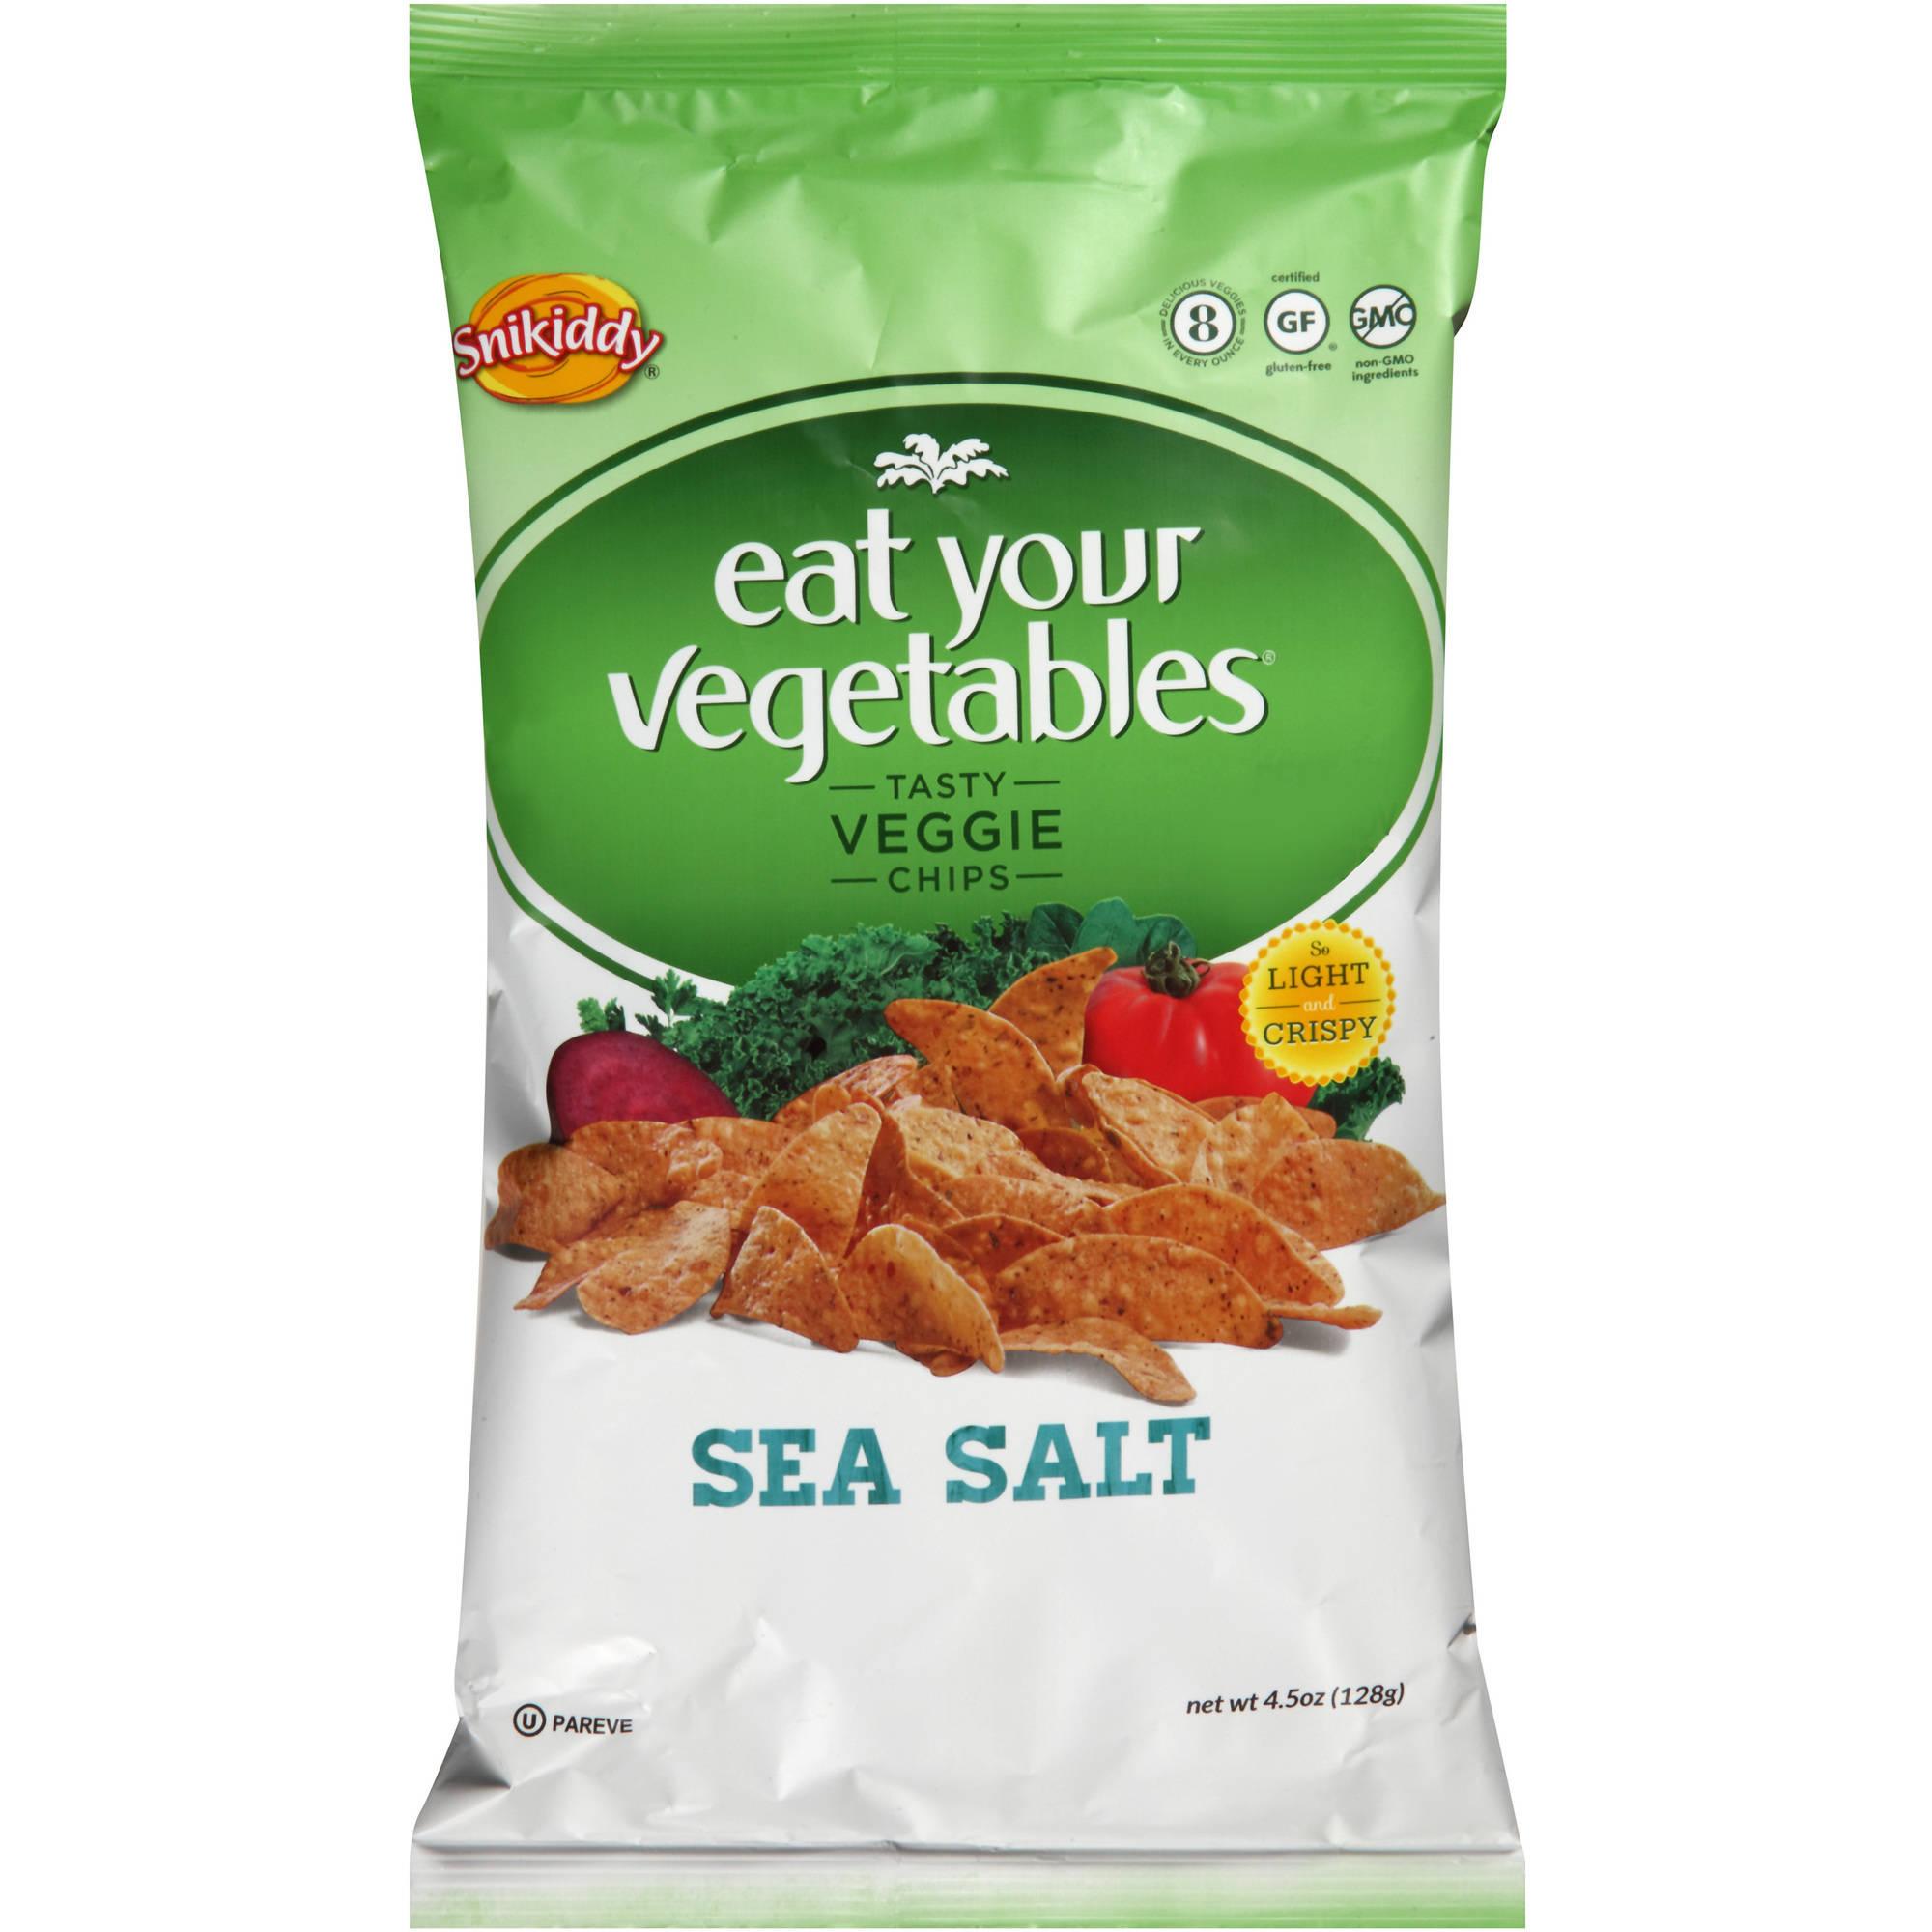 Good Health Natural Products Inc. Snikiddy Snacks Eat Your Vegetables Tasty Veggie Chips  -  Sea Salt  -  Case of 12  -  4.5 oz.  -